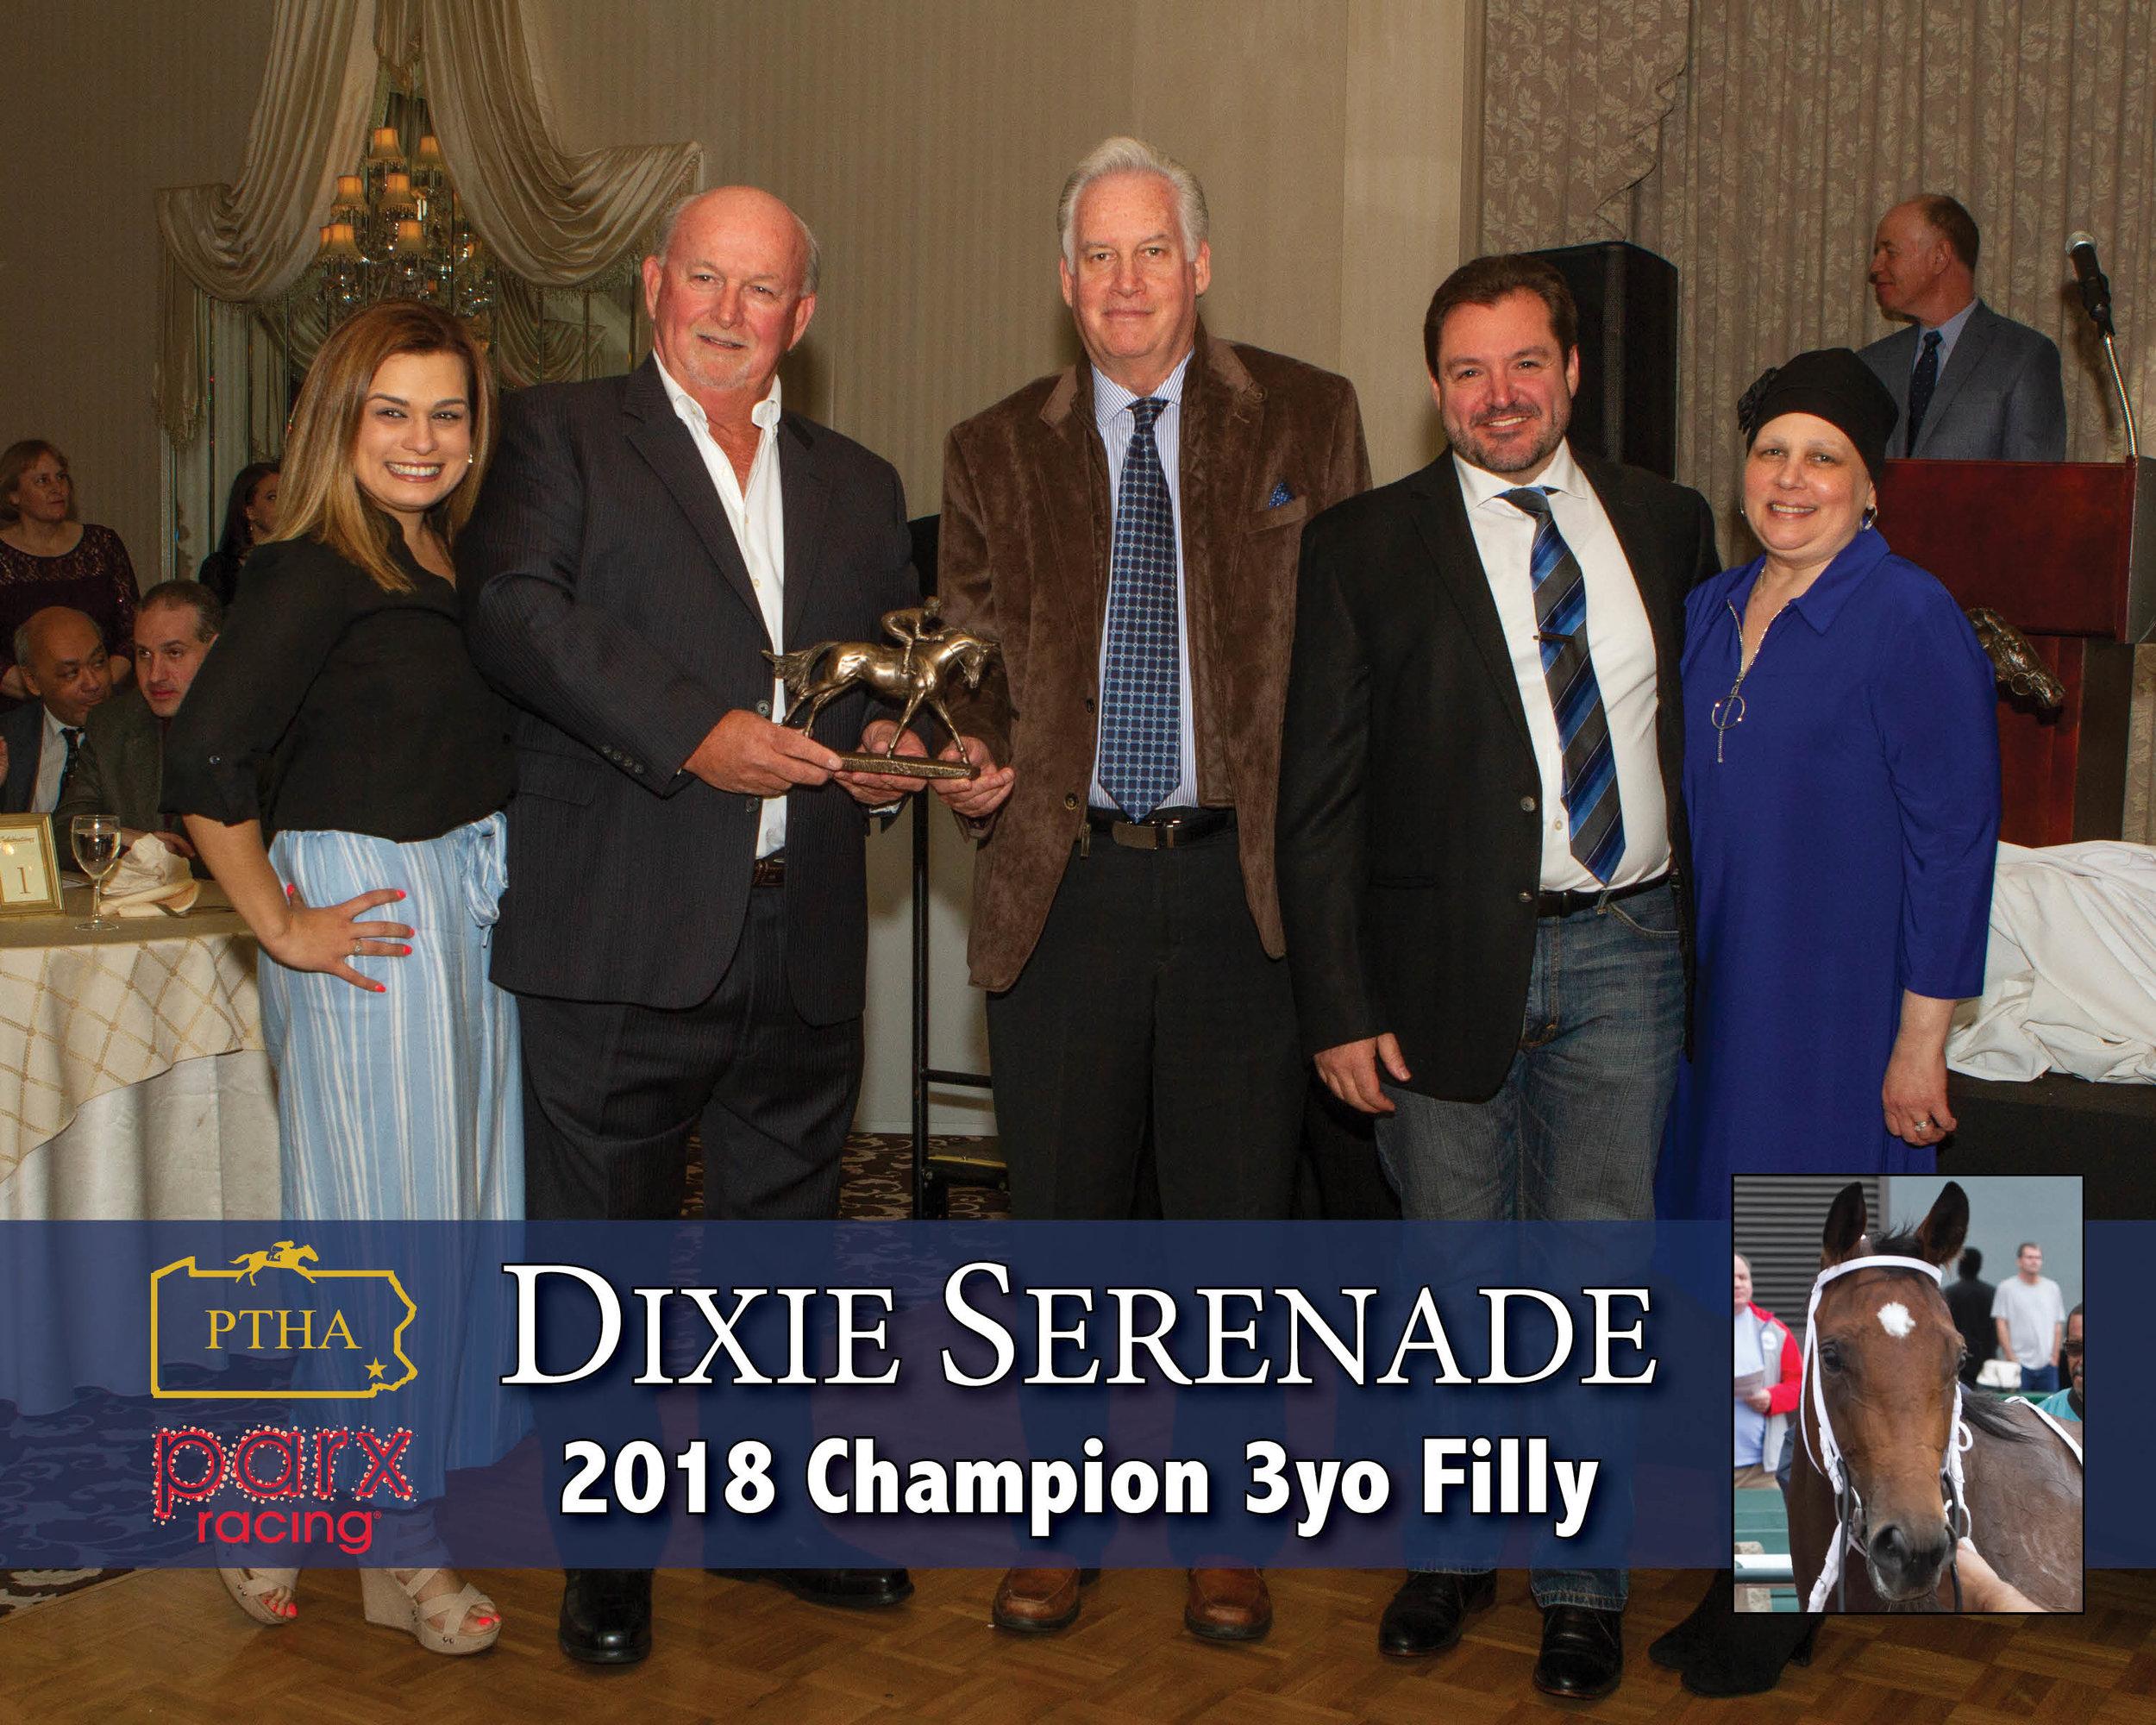 2018 3yo Filly Dixie Serenade.jpg